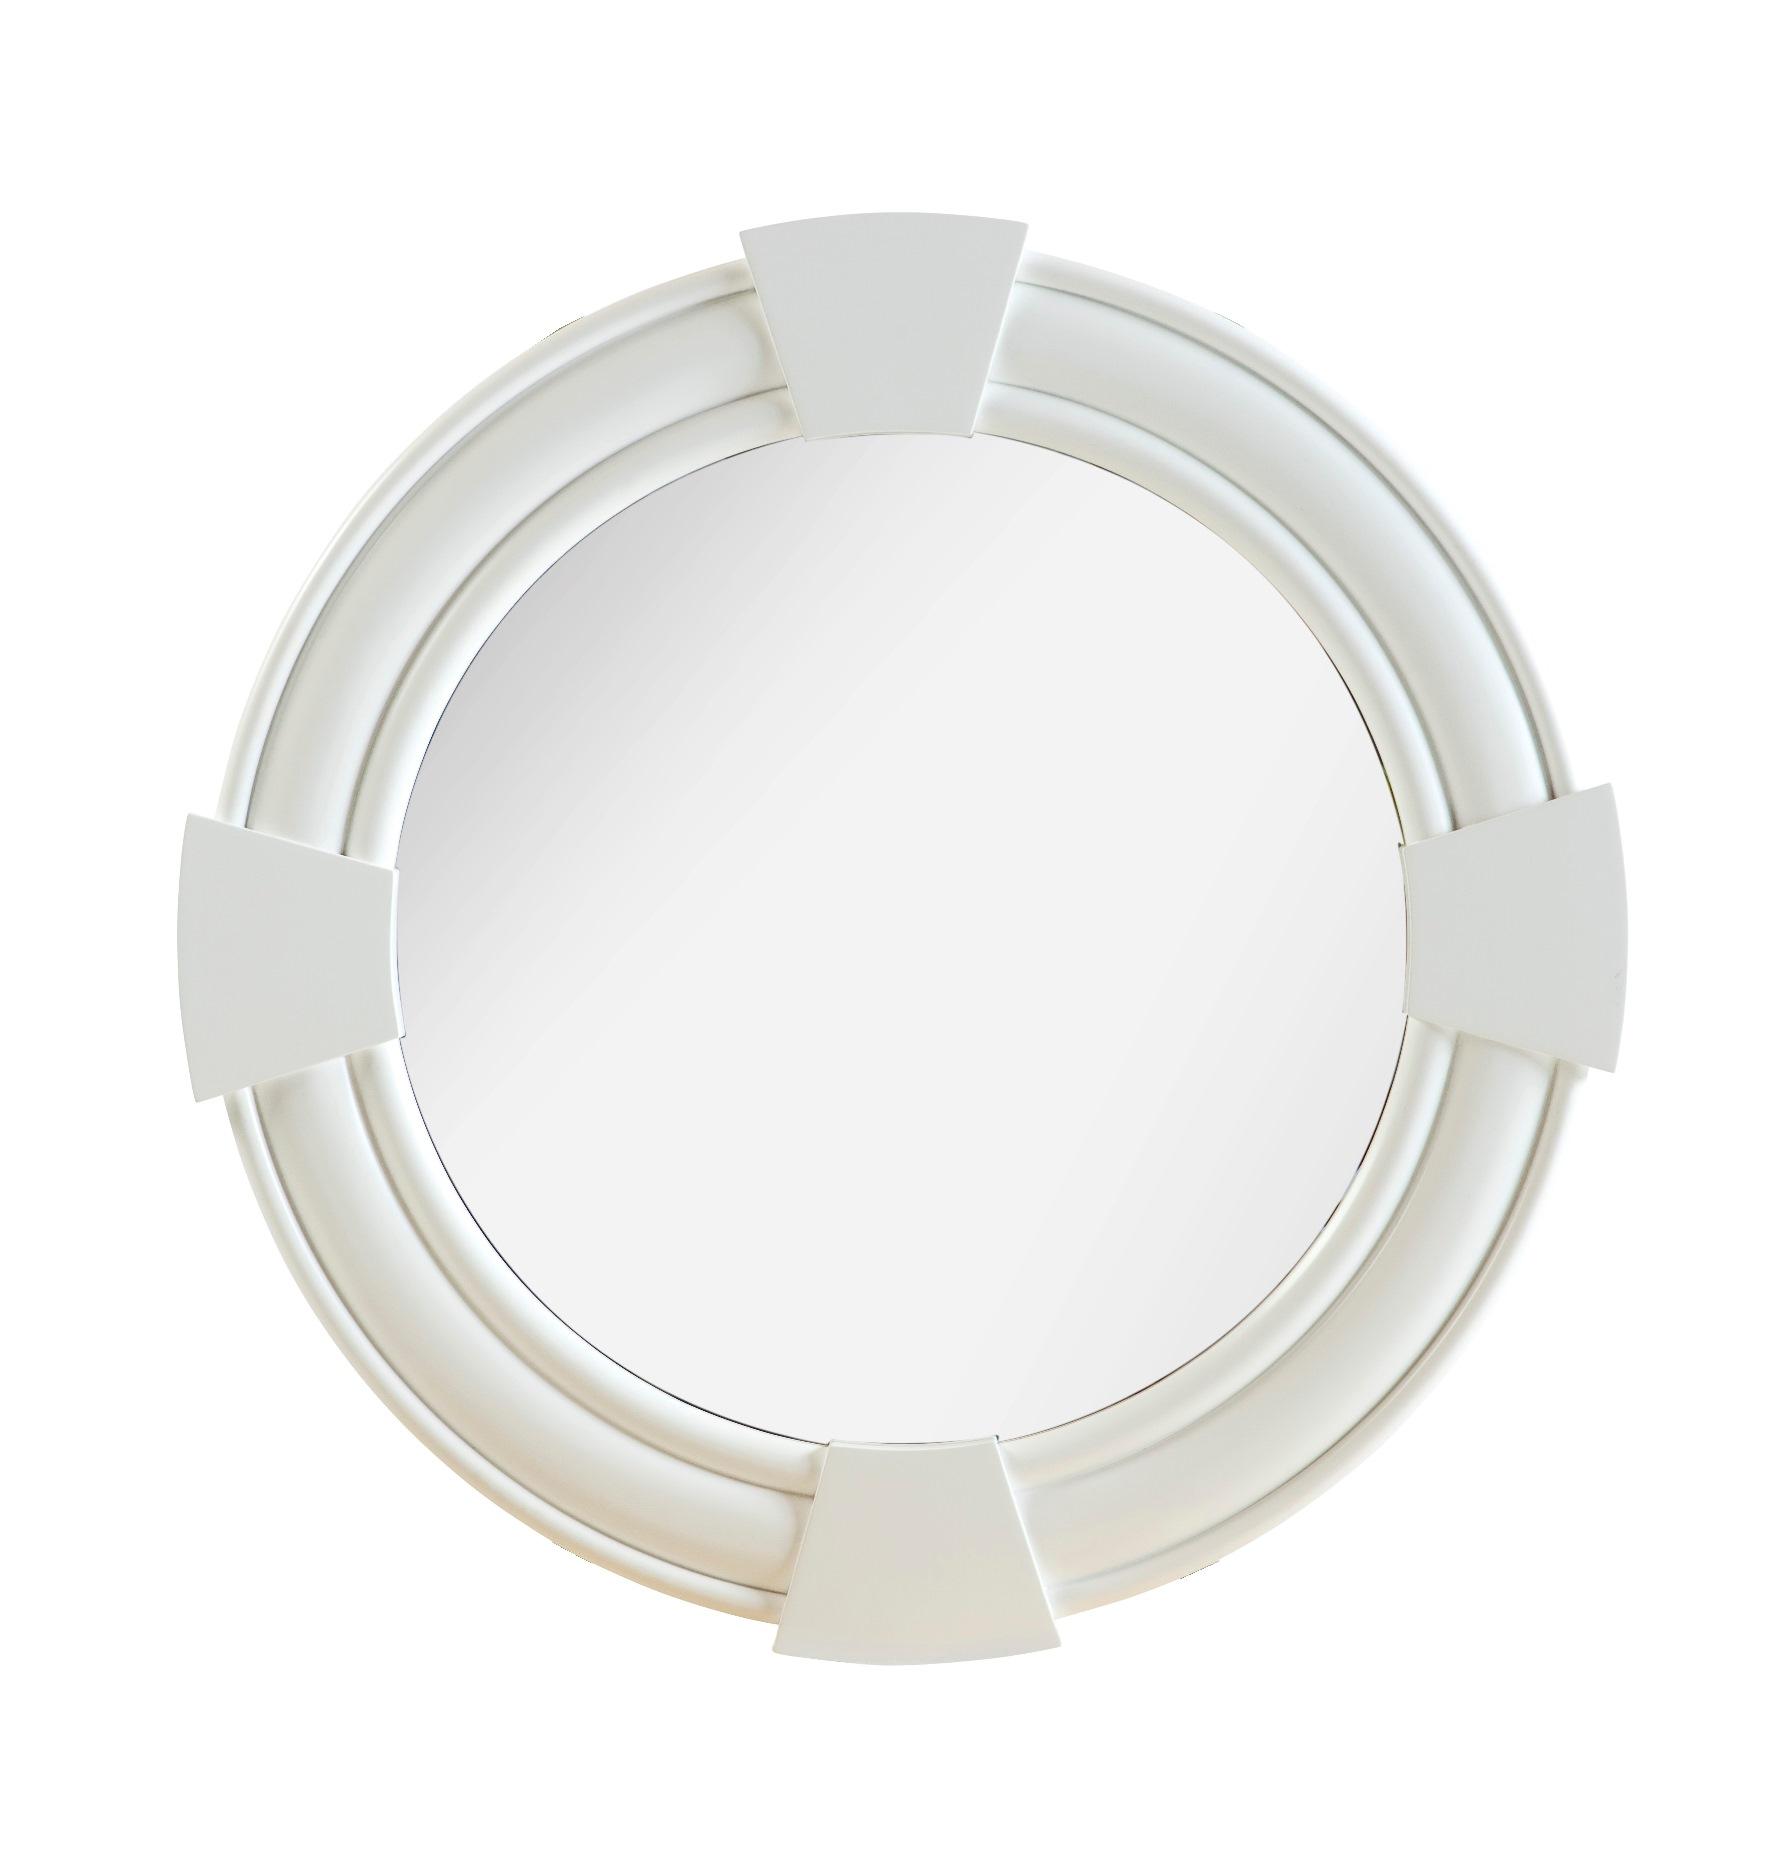 Sailor Mirror